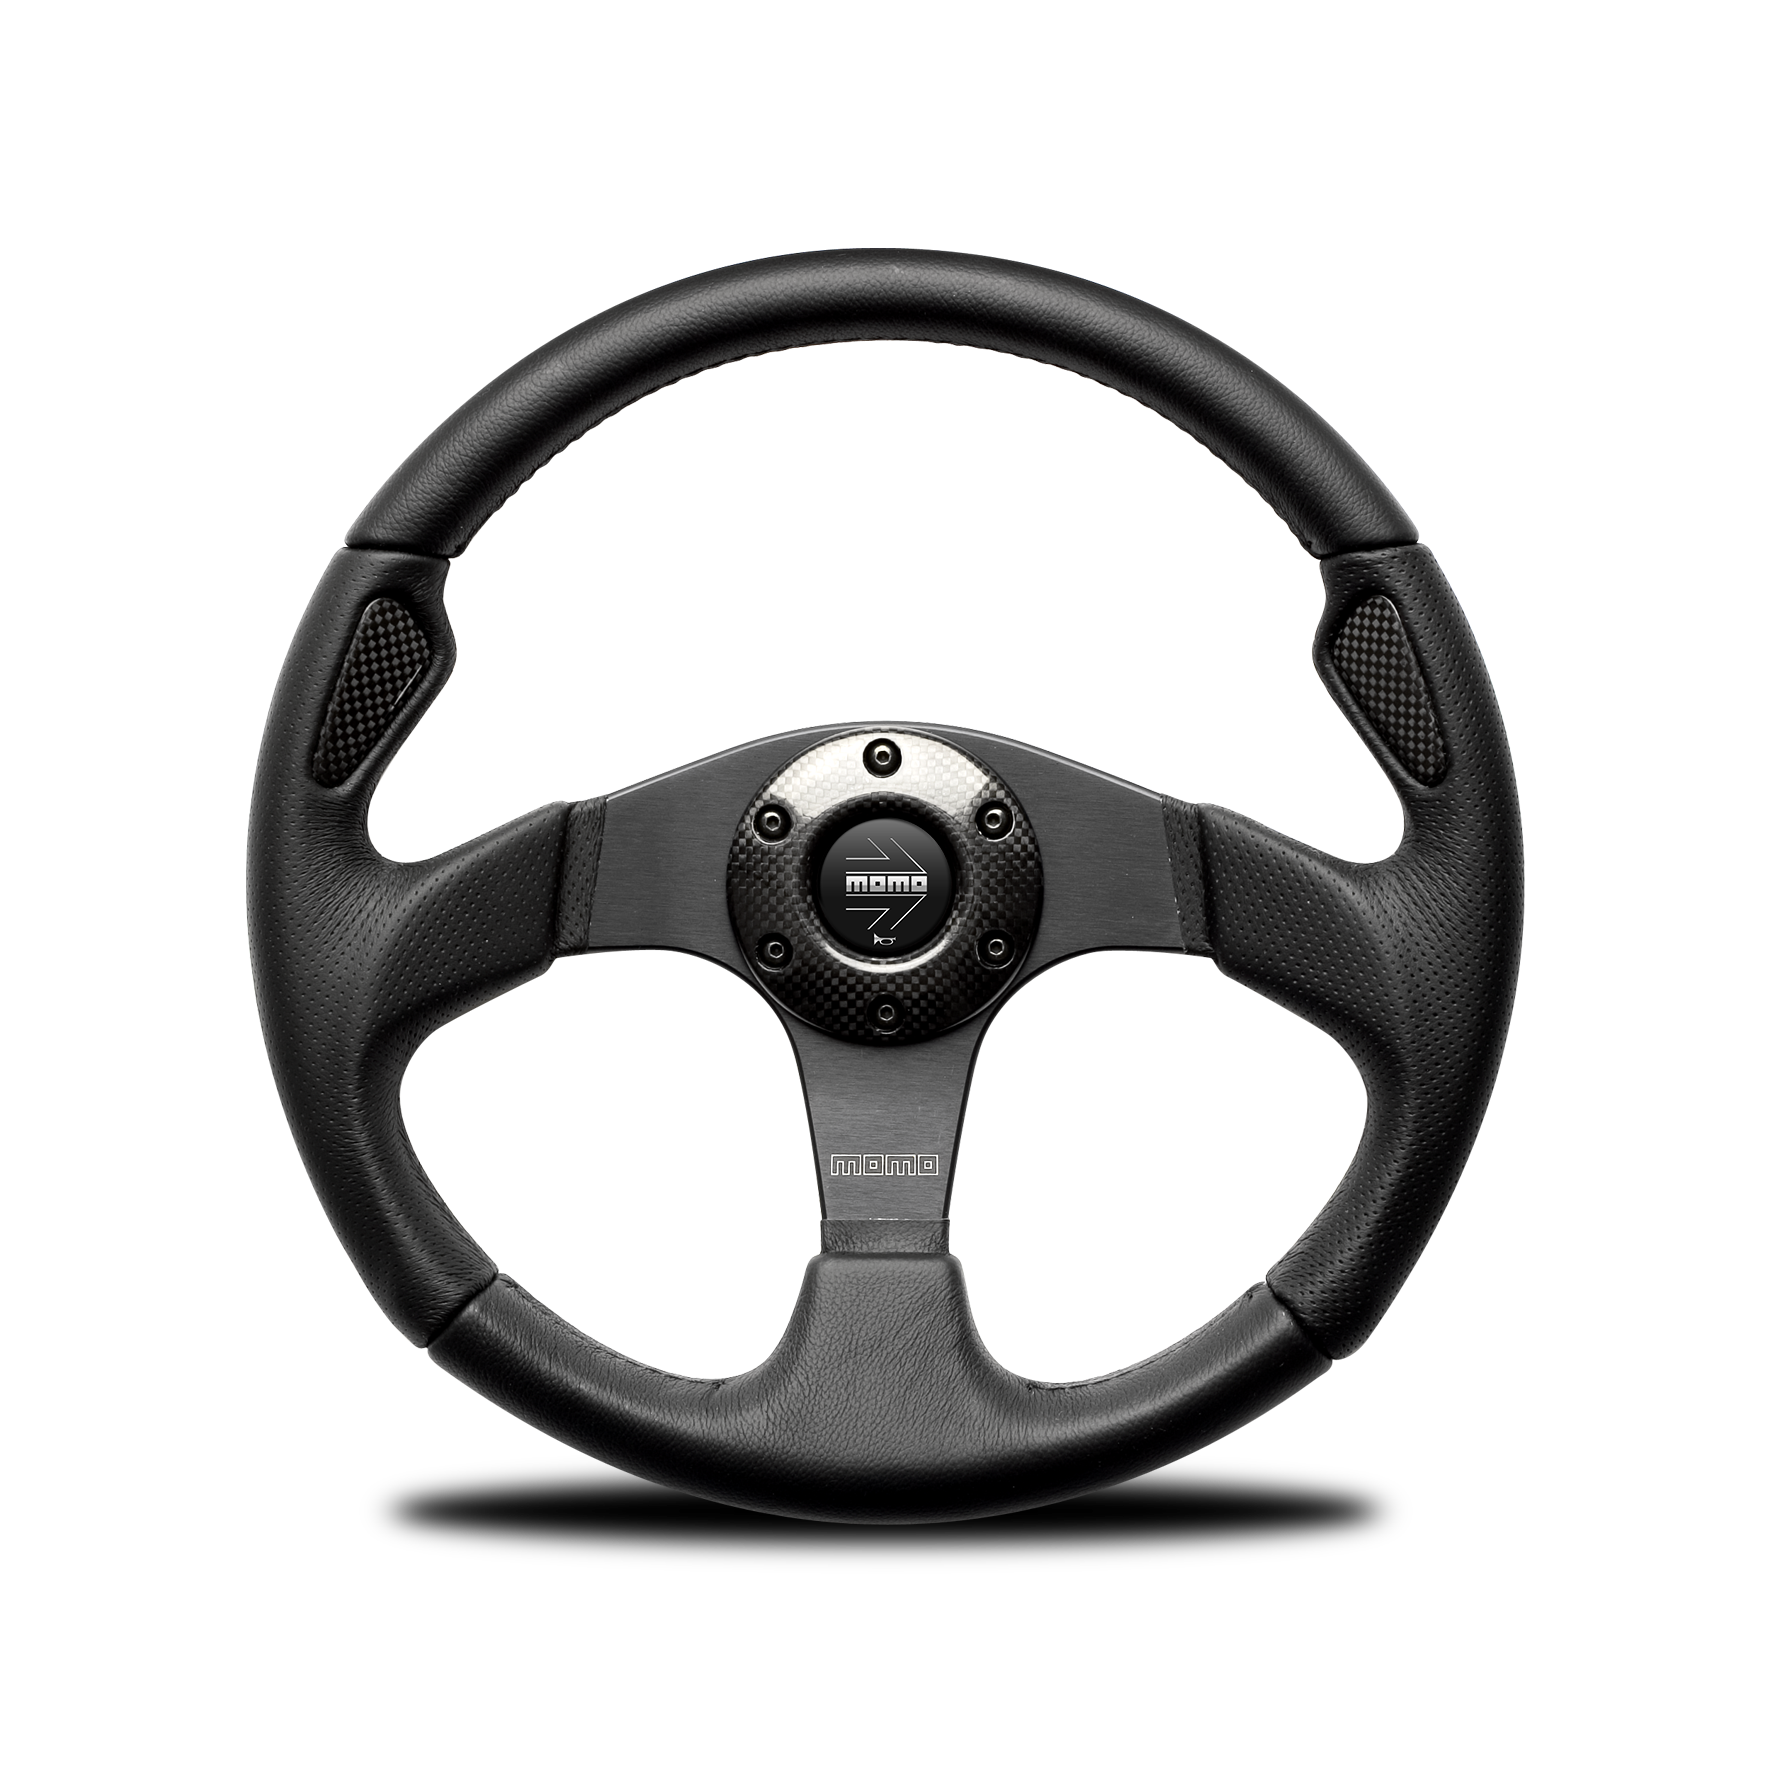 Porsche Momo steering wheel Jet black leather 350mm.